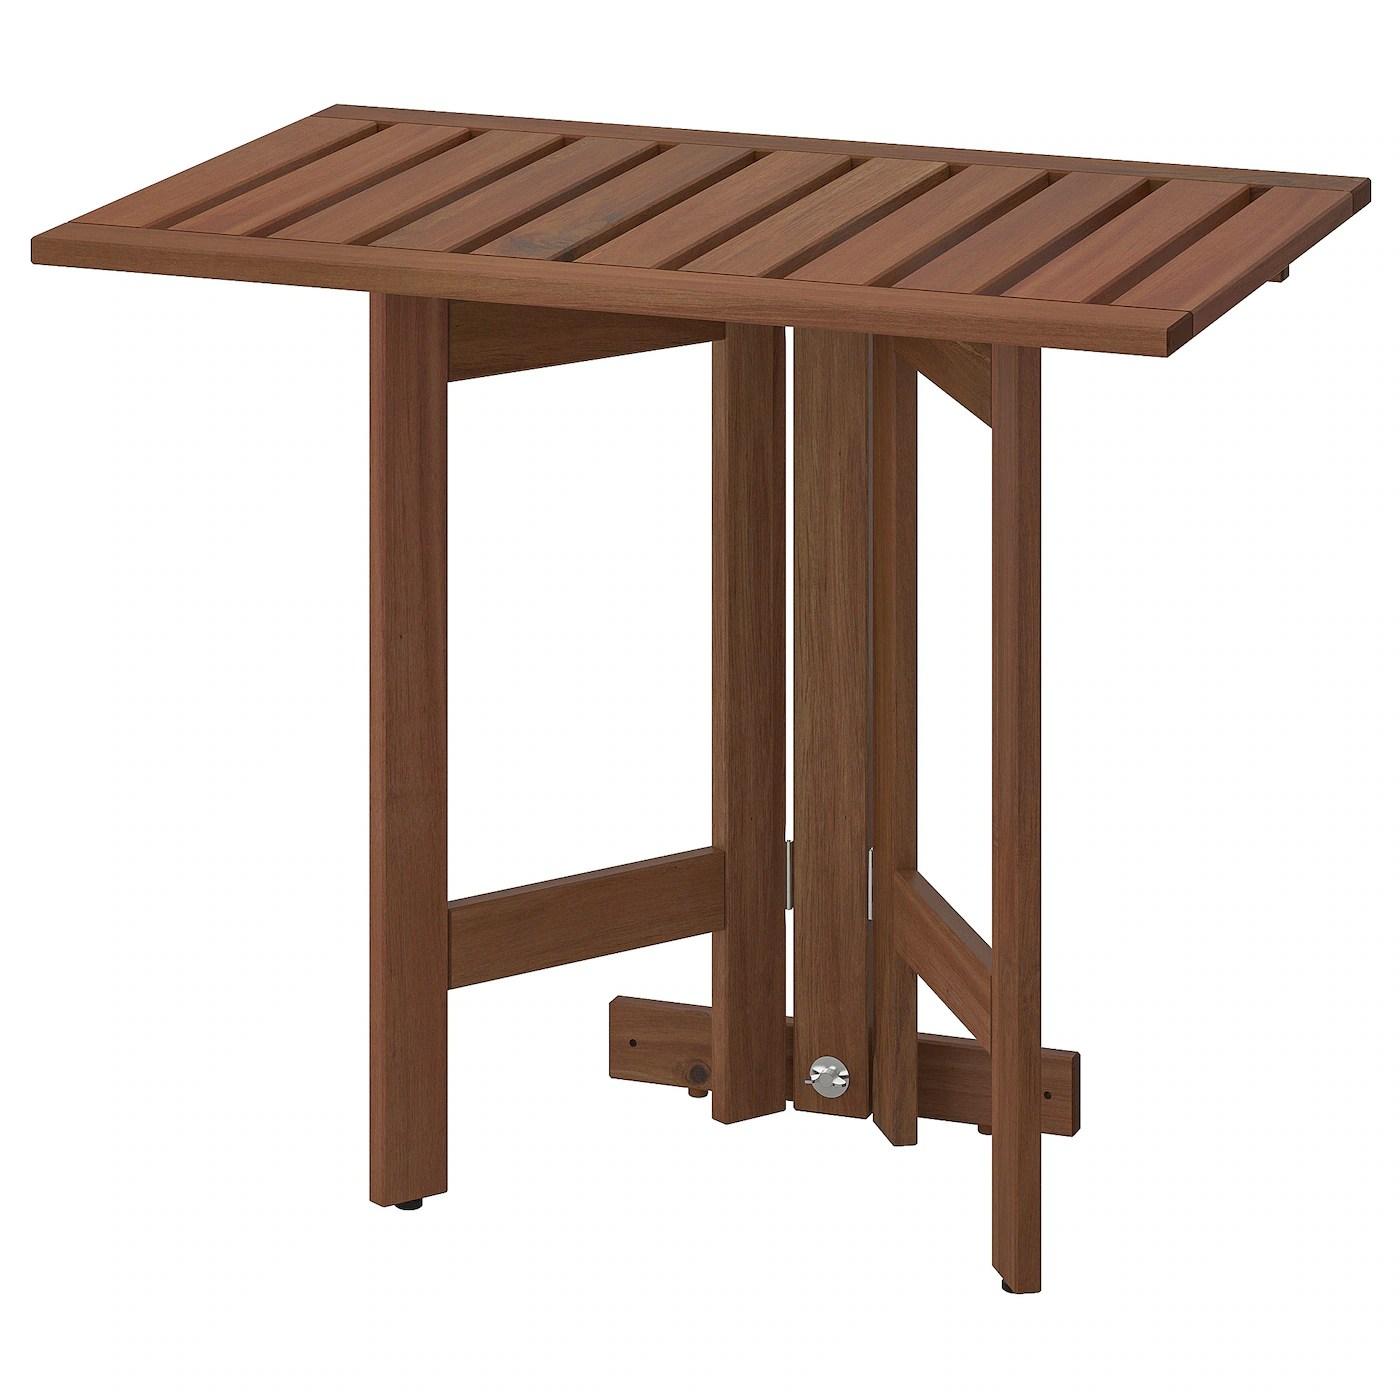 Applaro Table De Jardin Murale Pliante Teinte Brun Ikea Ikea